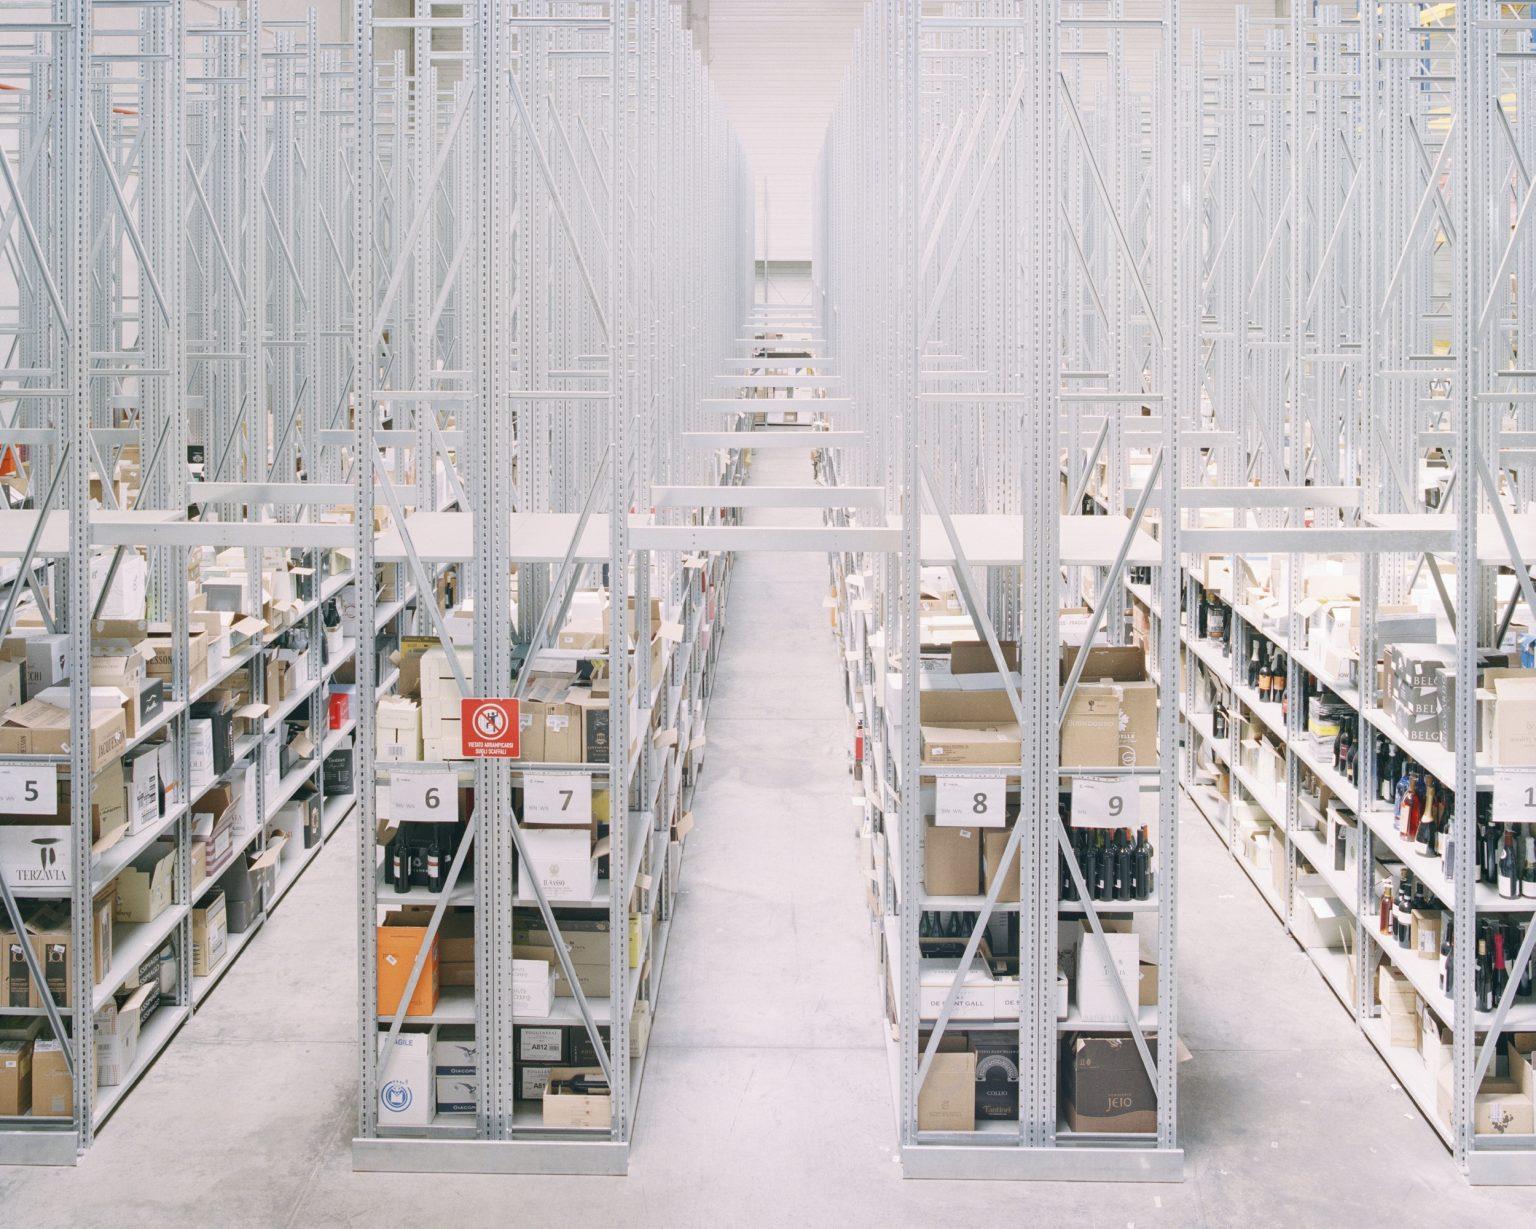 Fiege, Arese (MI), 2017. Fiege, a German company specialized in e-commerce logistics of different brands. Inside the warehouse Arese 4, logistic center of Tannico and Vino75 (online wine shops). The warehouse is inside the old factory of Alfa Romeo in Arese. >< Fiege, Arese (MI), 2017. Azienda tedesca specializzata nella logistica di numerosi marchi. Nel magazzino Arese 4 sono presenti Tannico e Vino75 (e-commerce specializzato in vino). Il magazzino ospitava la vecchia industria automobilistica dell'Alfa Romeo di Arese.